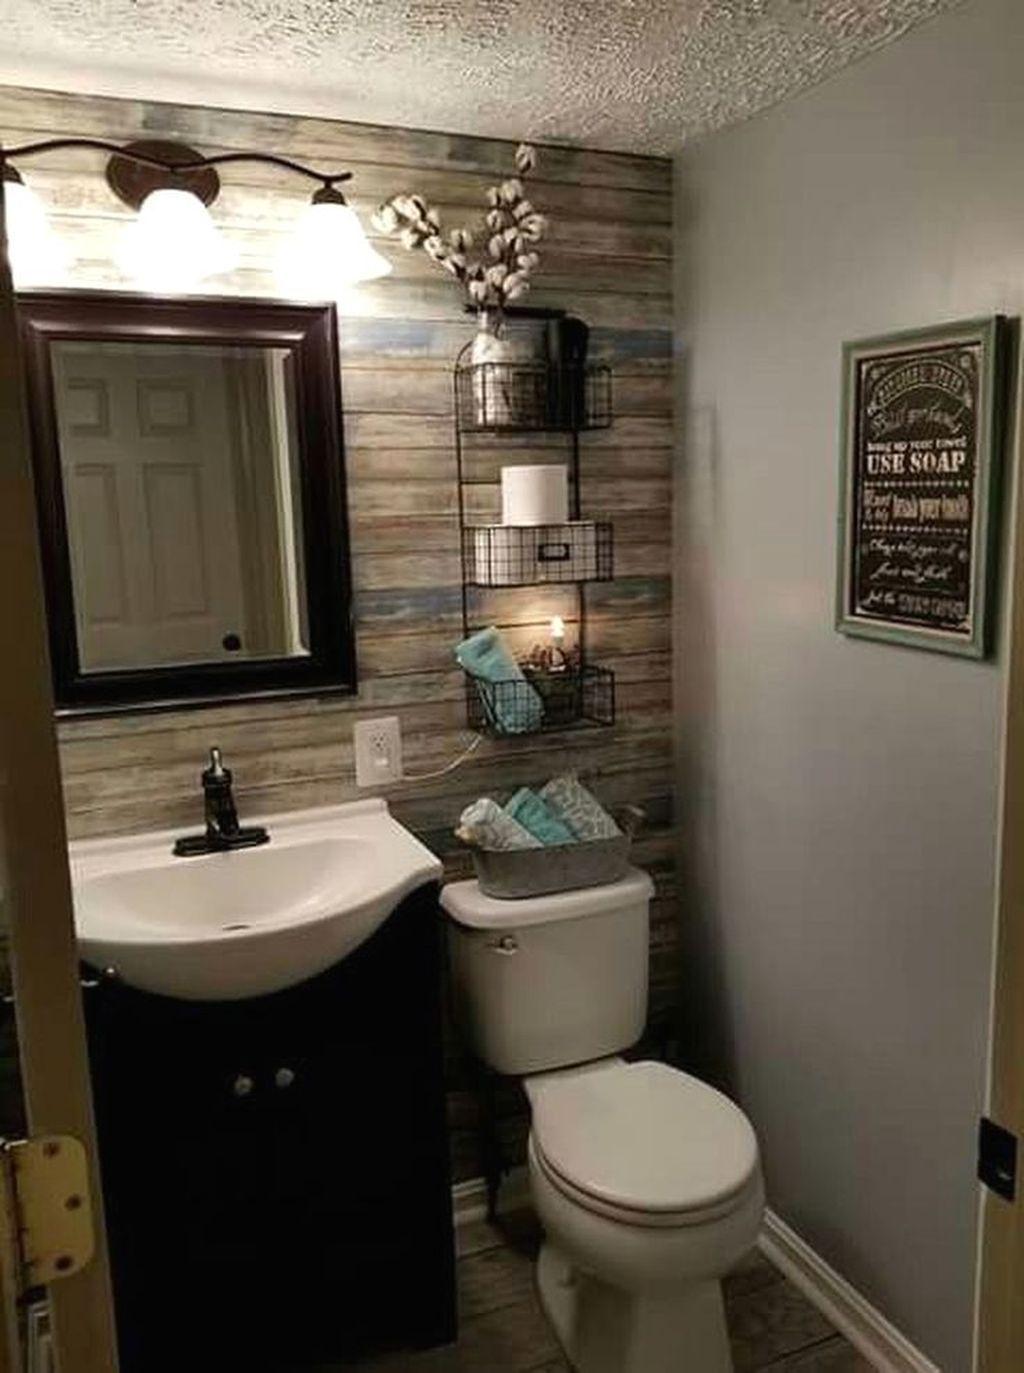 39 Vintage Farmhouse Bathroom Decor Design Ideas Small Bathroom Decor Cottage Bathroom Small Bathroom Remodel